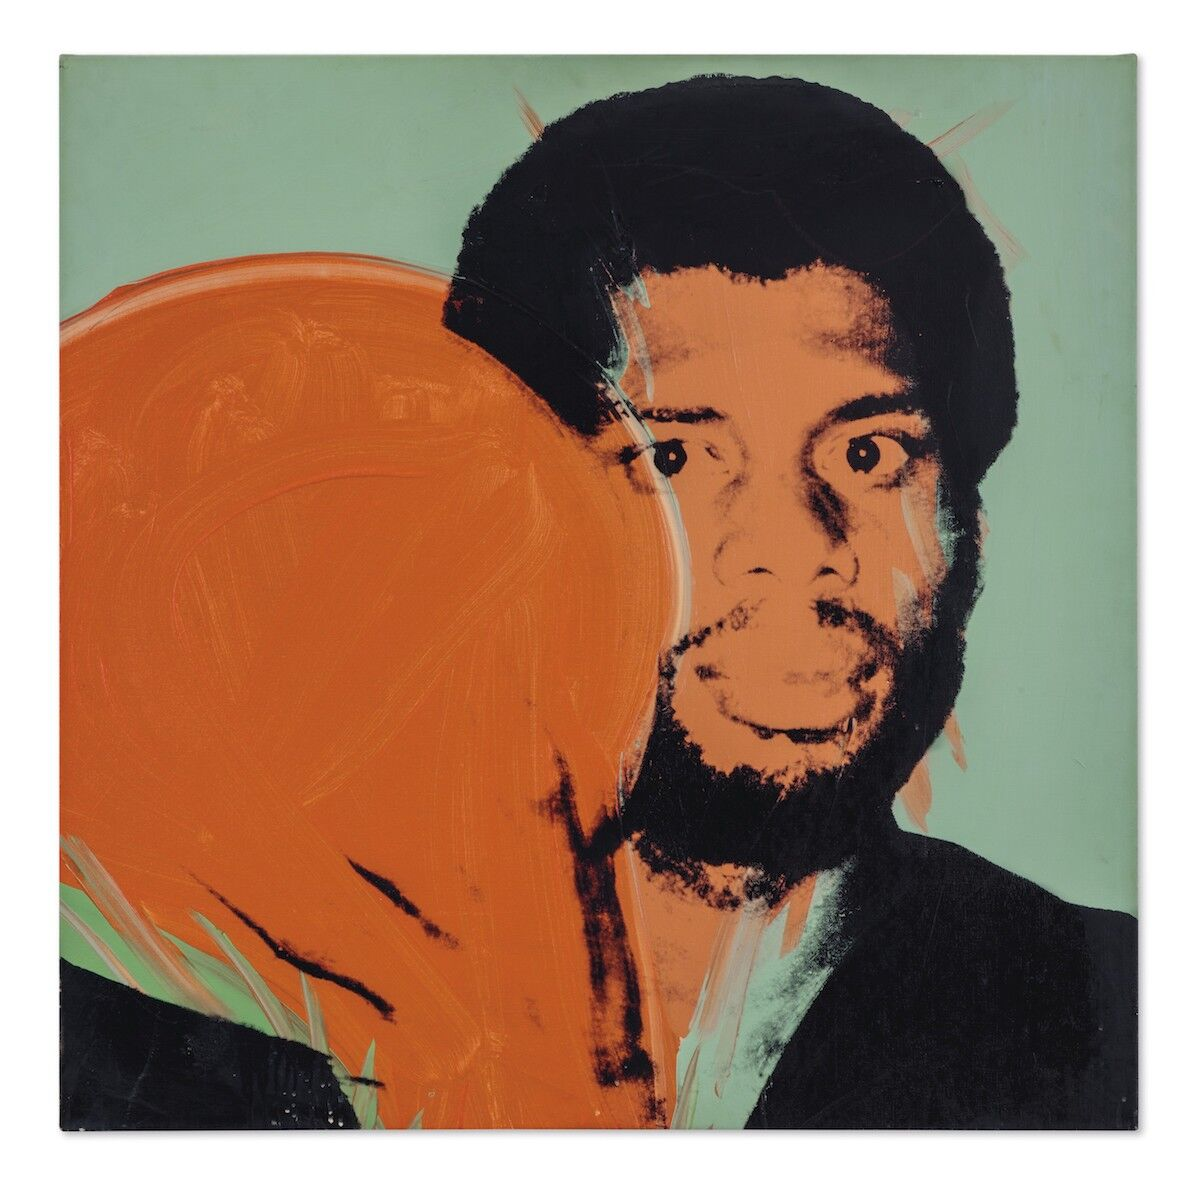 Andy Warhol, Kareem Abdul-Jabbar, 1977–79. Est. $300,000–$500,000. Courtesy Christie's Images Ltd.